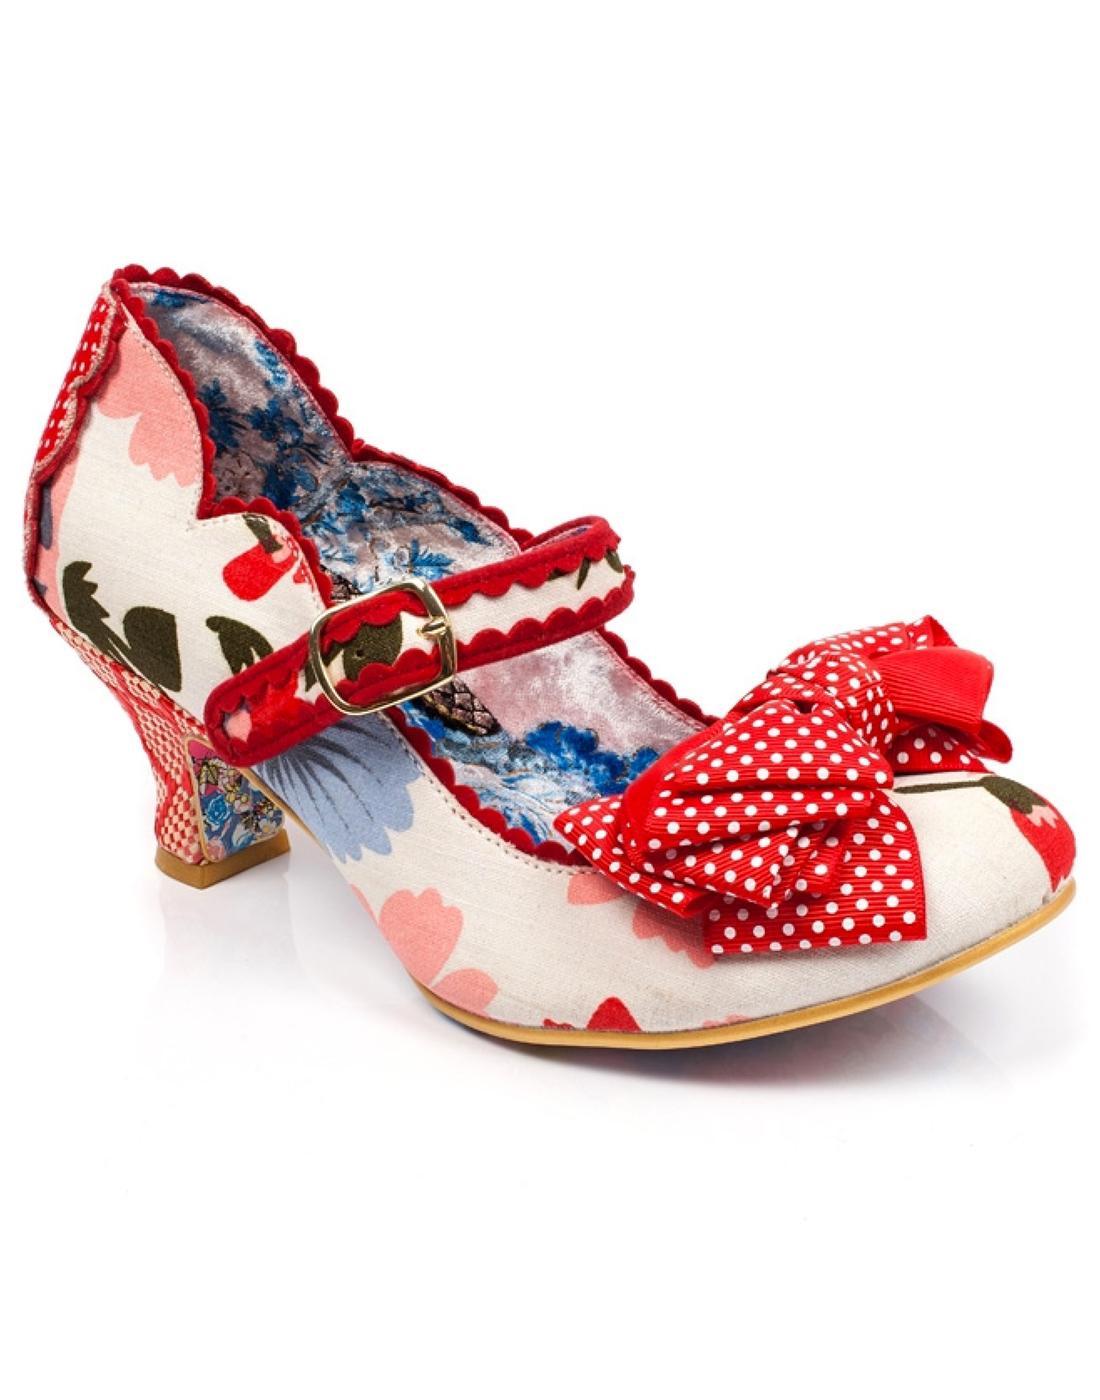 Balmy Nights IRREGULAR CHOICE Retro Shoes - White